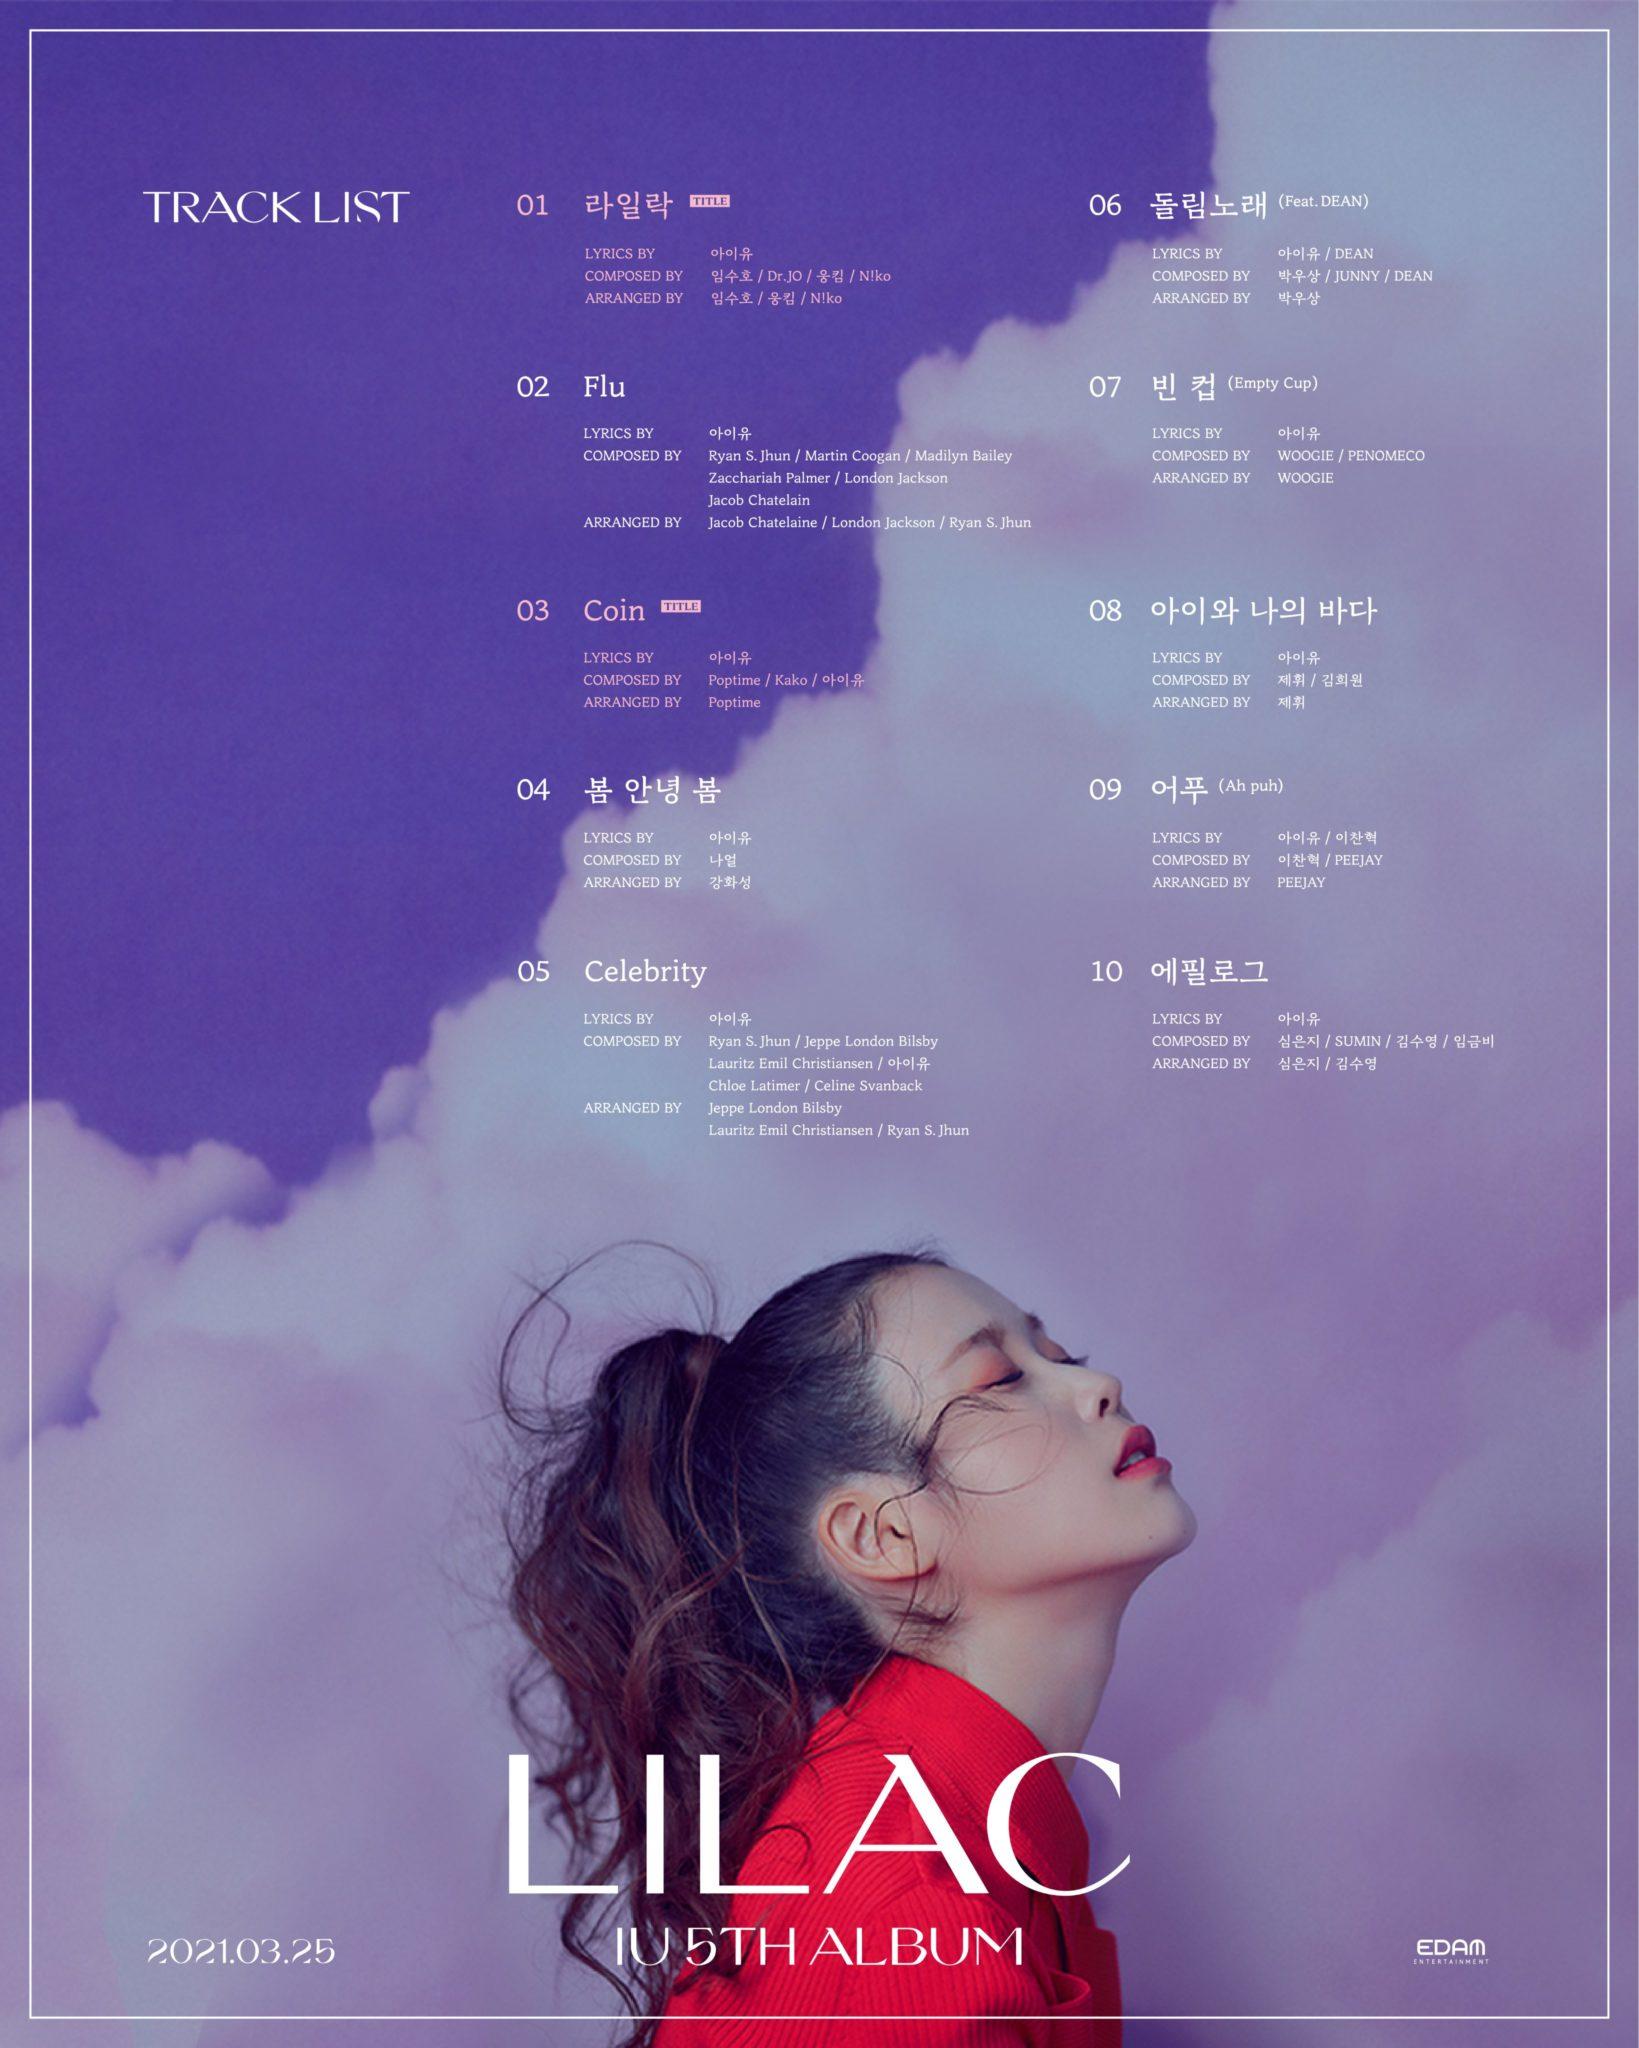 IU Reveals Track List of The 5th Full Album 'LILAC'